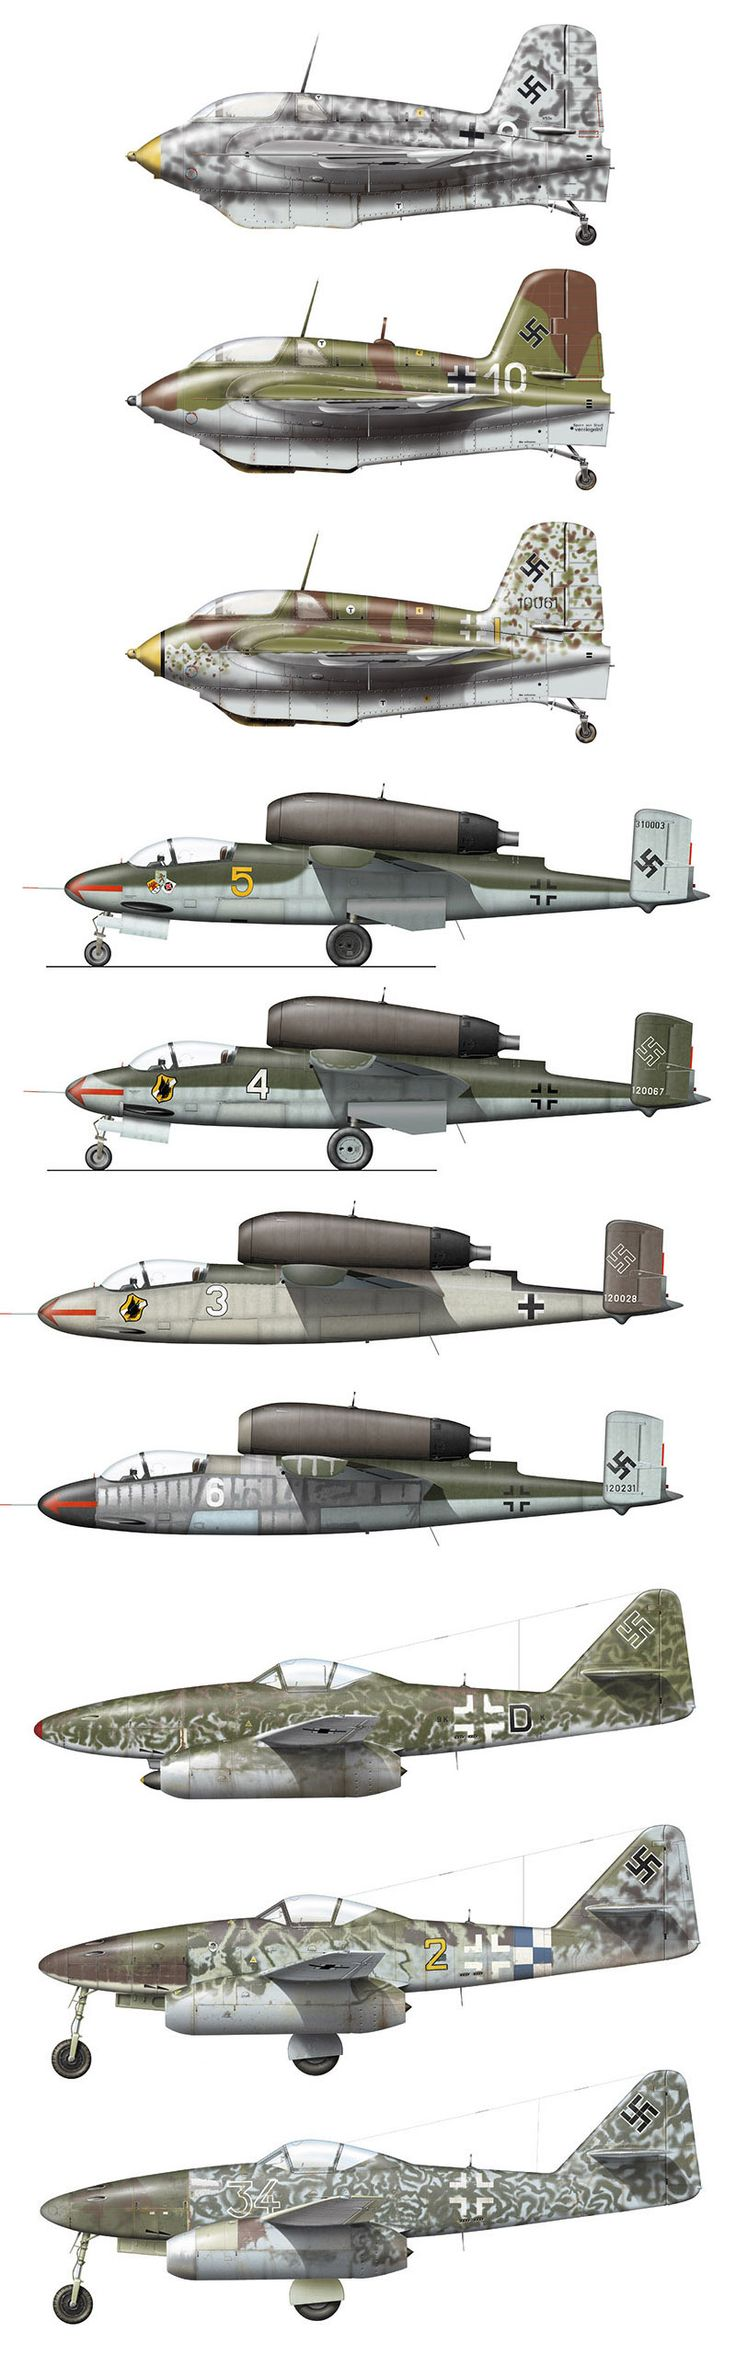 Luftwaffe Jets  Me 163 / He 162 / Me 262